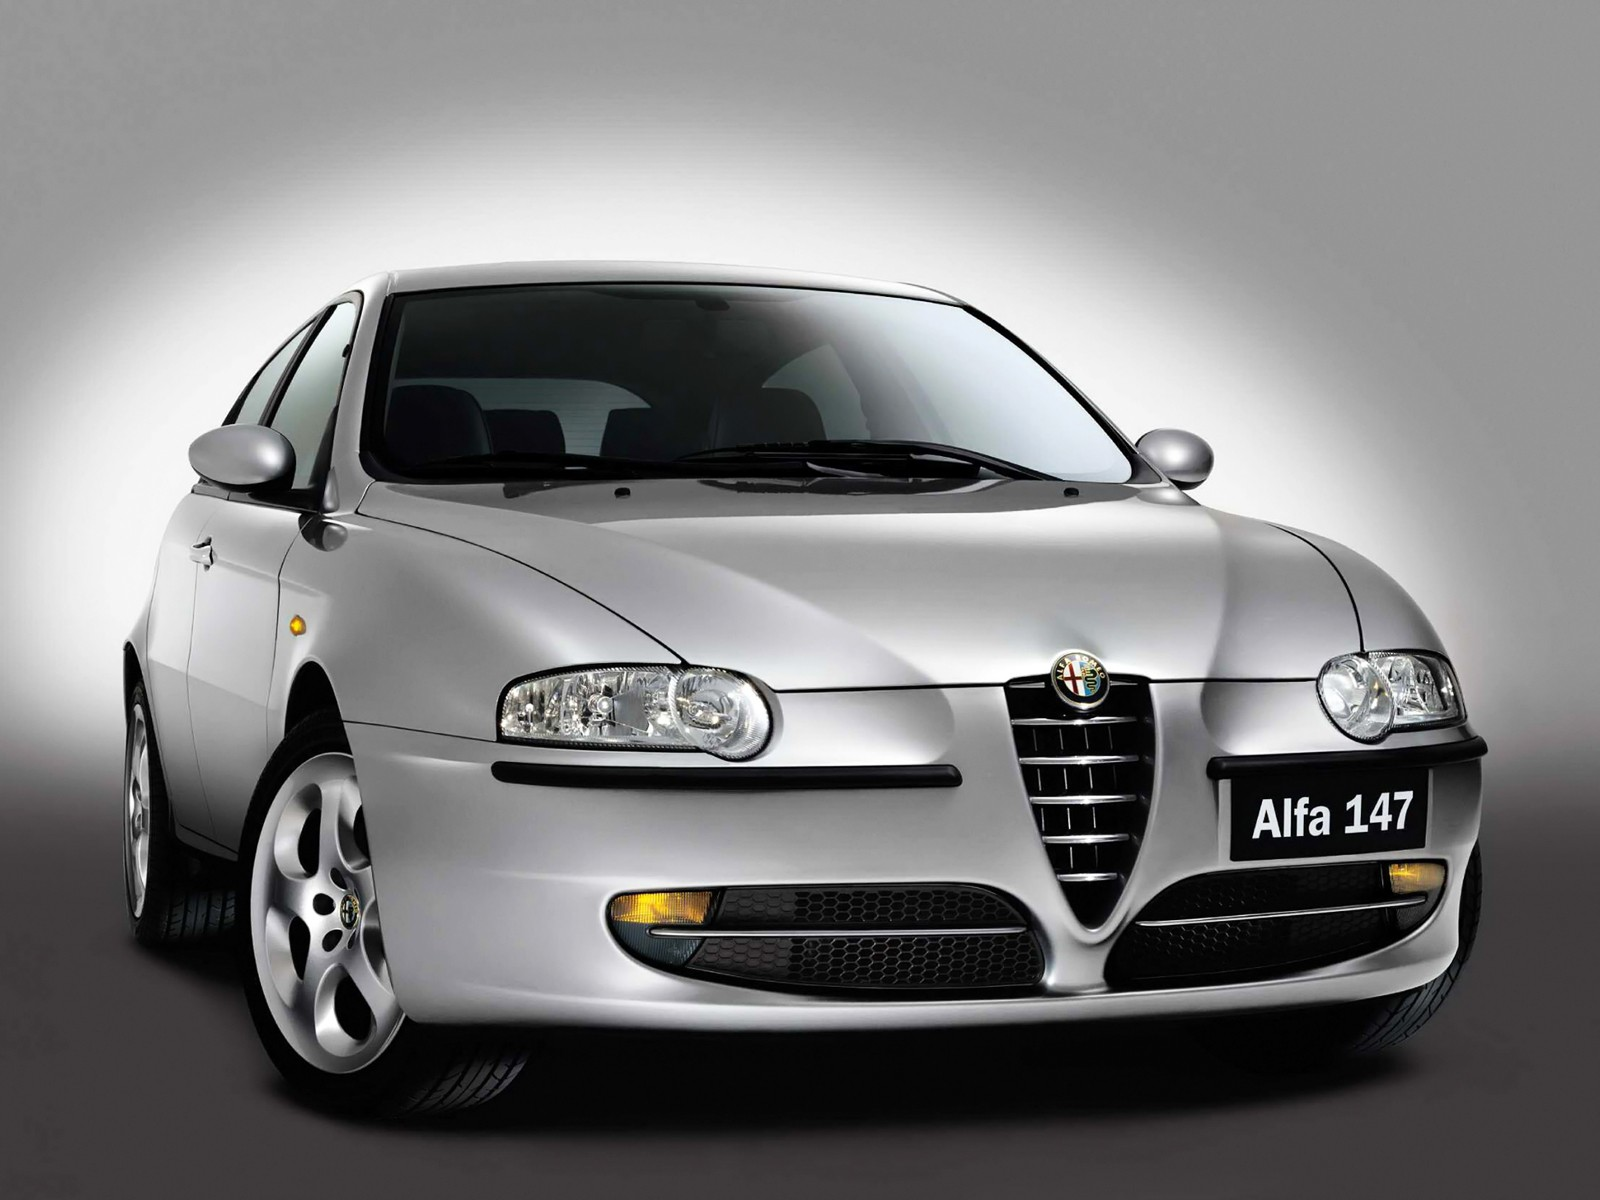 alfa romeo 147 5 doors specs 2000 2001 2002 2003 2004 2005 autoevolution. Black Bedroom Furniture Sets. Home Design Ideas